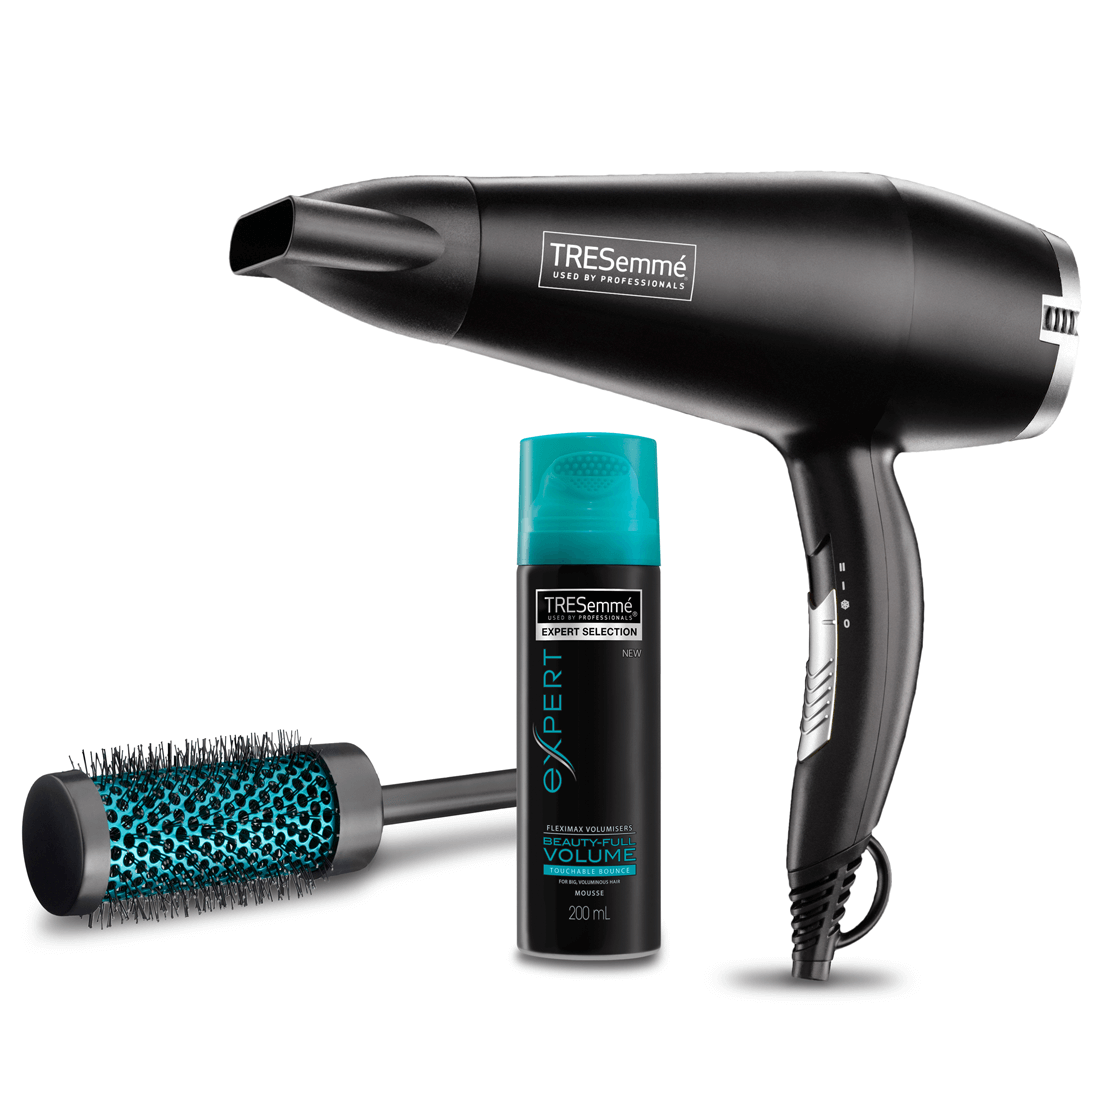 Tresemme Salon Volume Blow Hair Dryer|Tourmaline-Ceramic Technology|2200W|5542NU